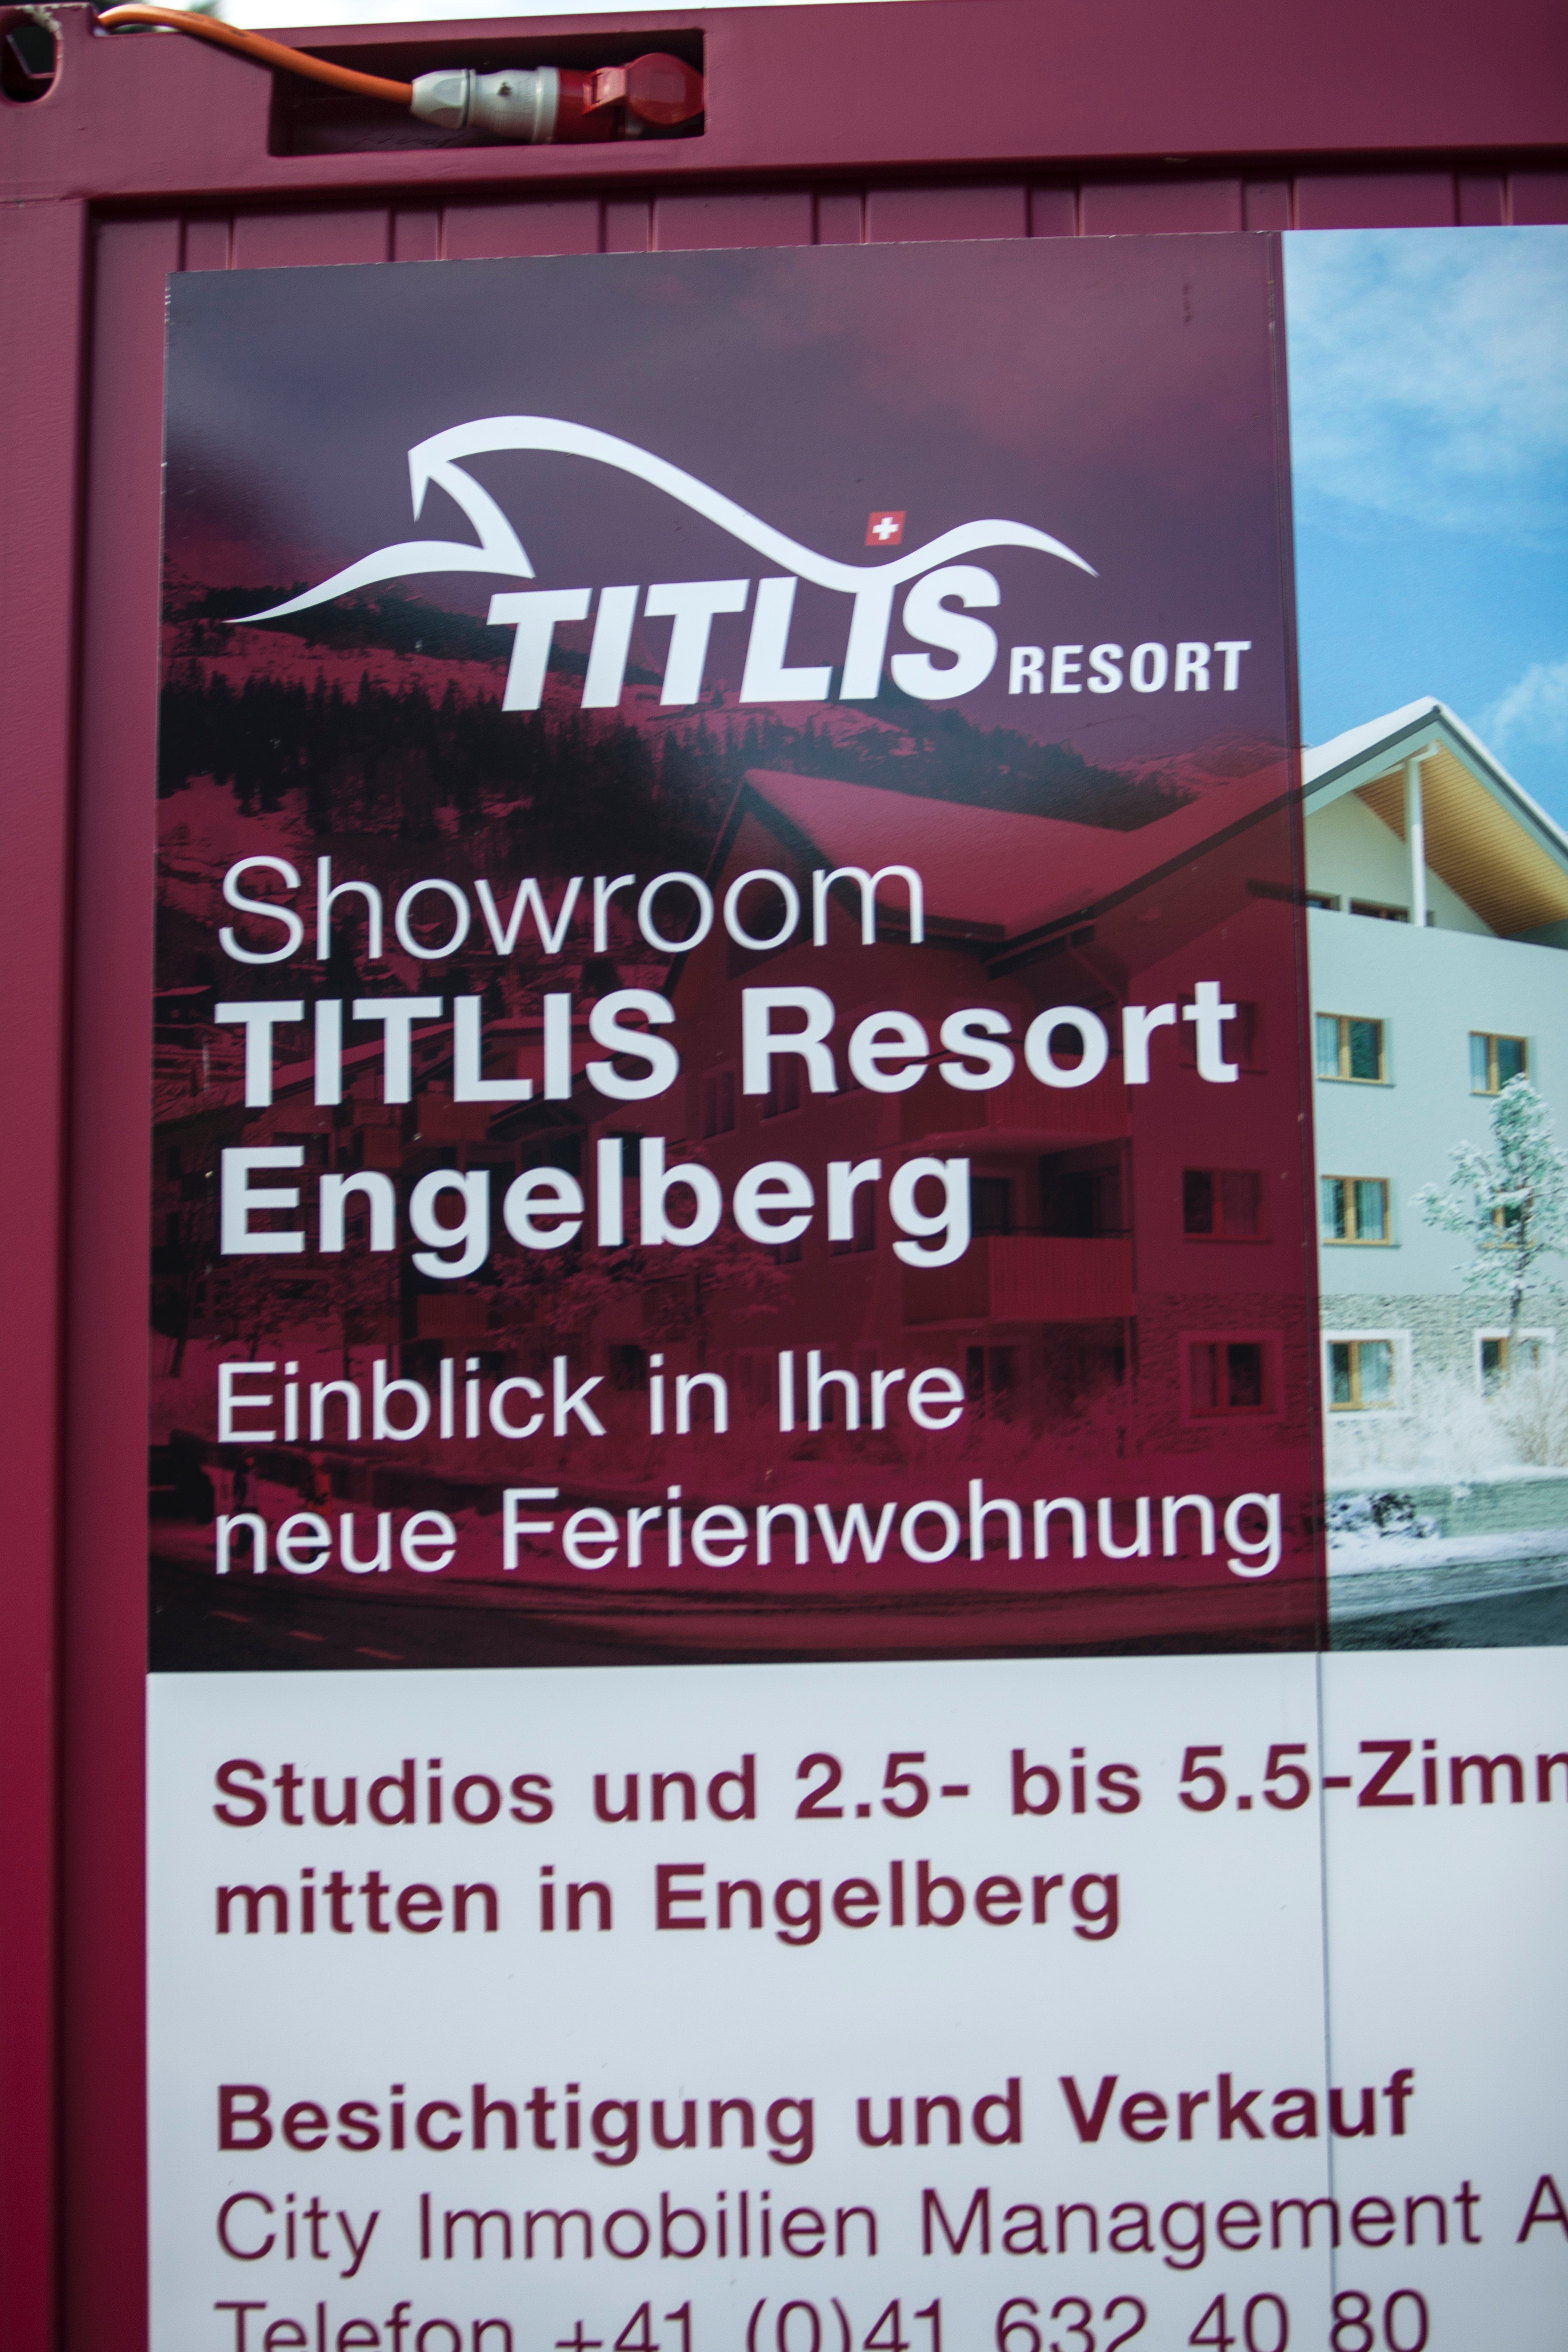 Titles resort info